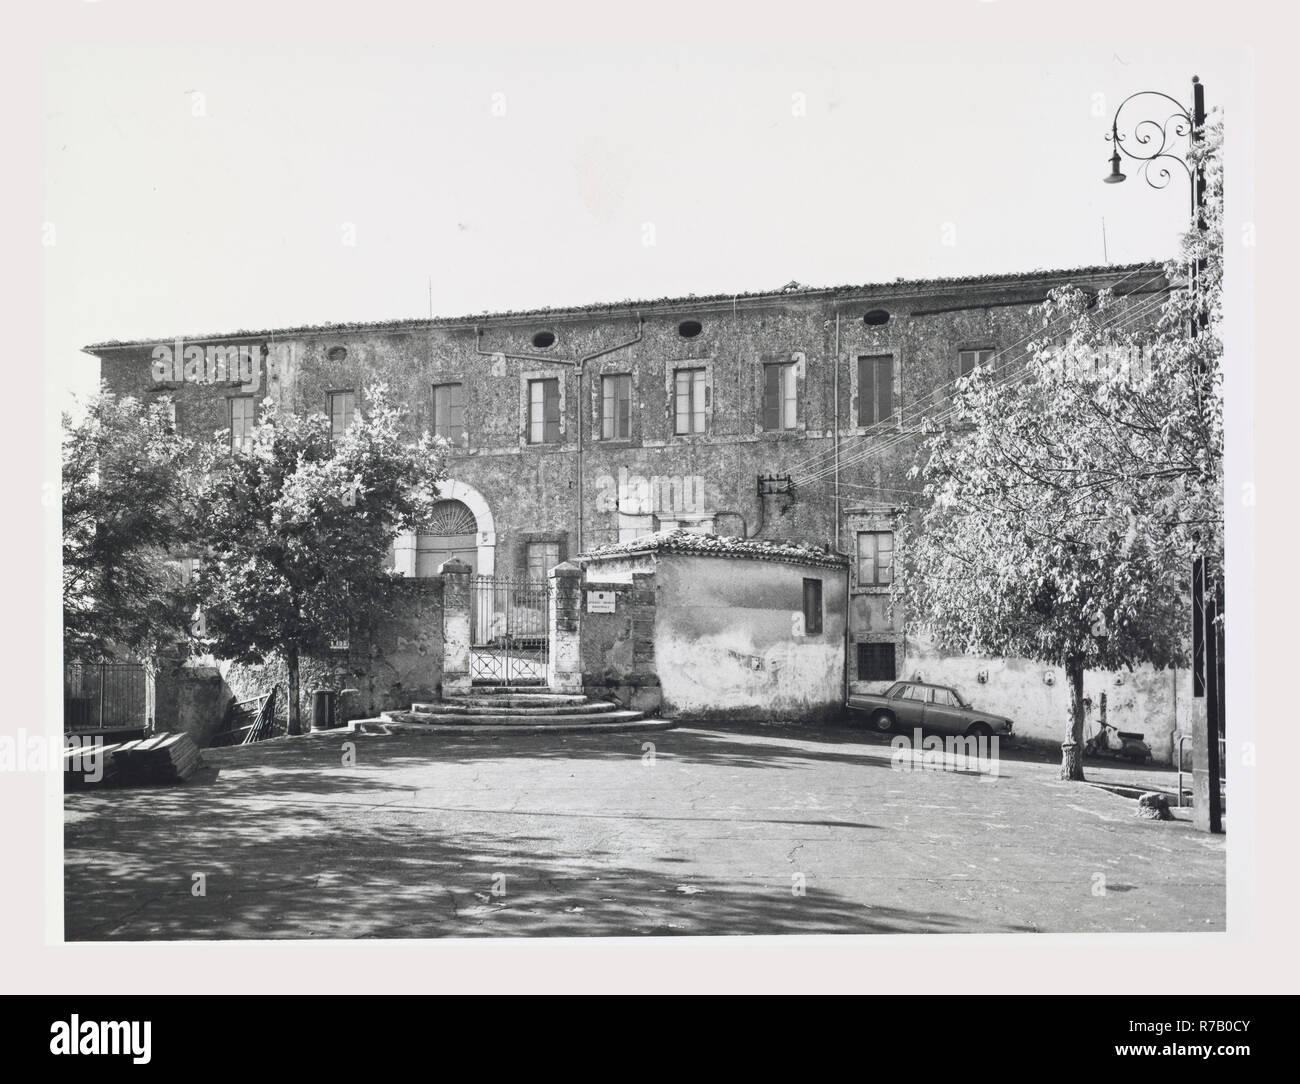 Lazio Frosinone Arpino Castello, this is my Italy, the italian country of visual history, Medieval Exterior views Stock Photo